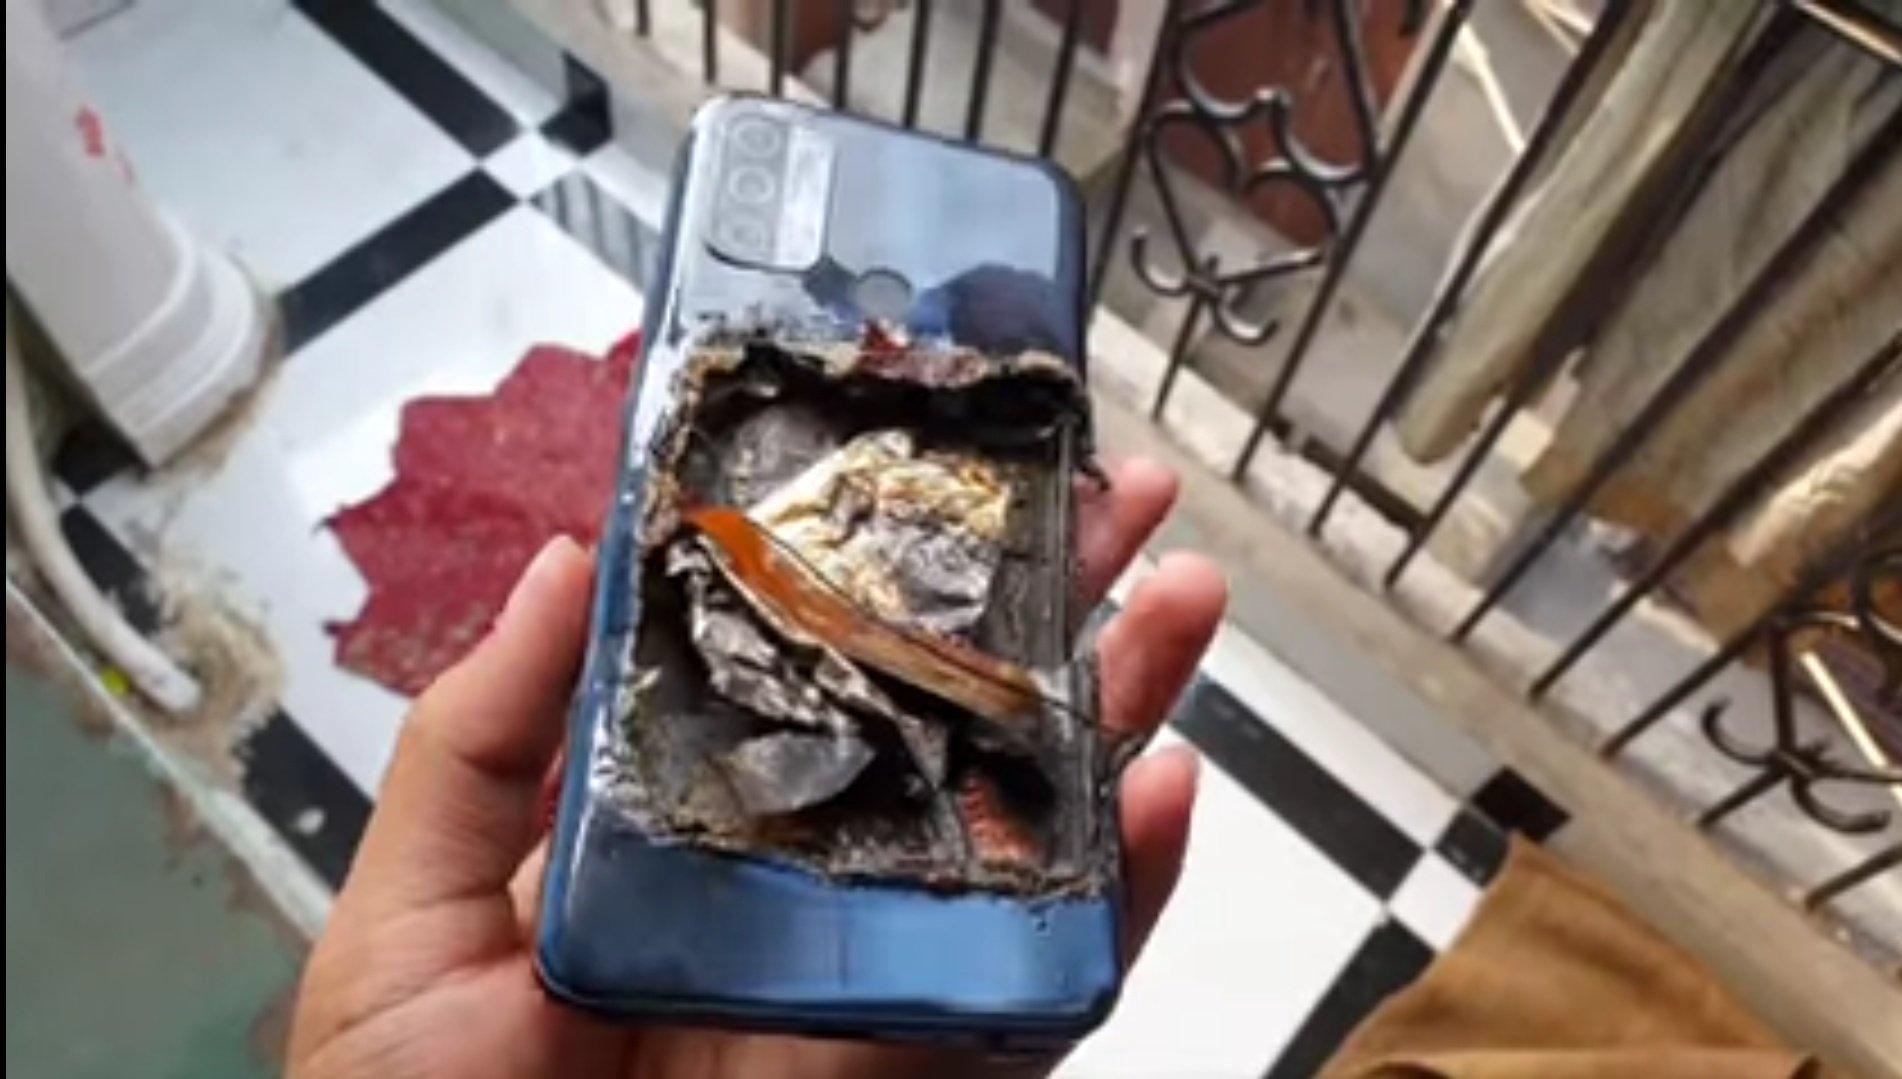 OPPO A53 взорвался у владельца в кармане Другие устройства  - smartfon_oppo_pokalechil_vladelca_vzorvavshis_v_karmane_4